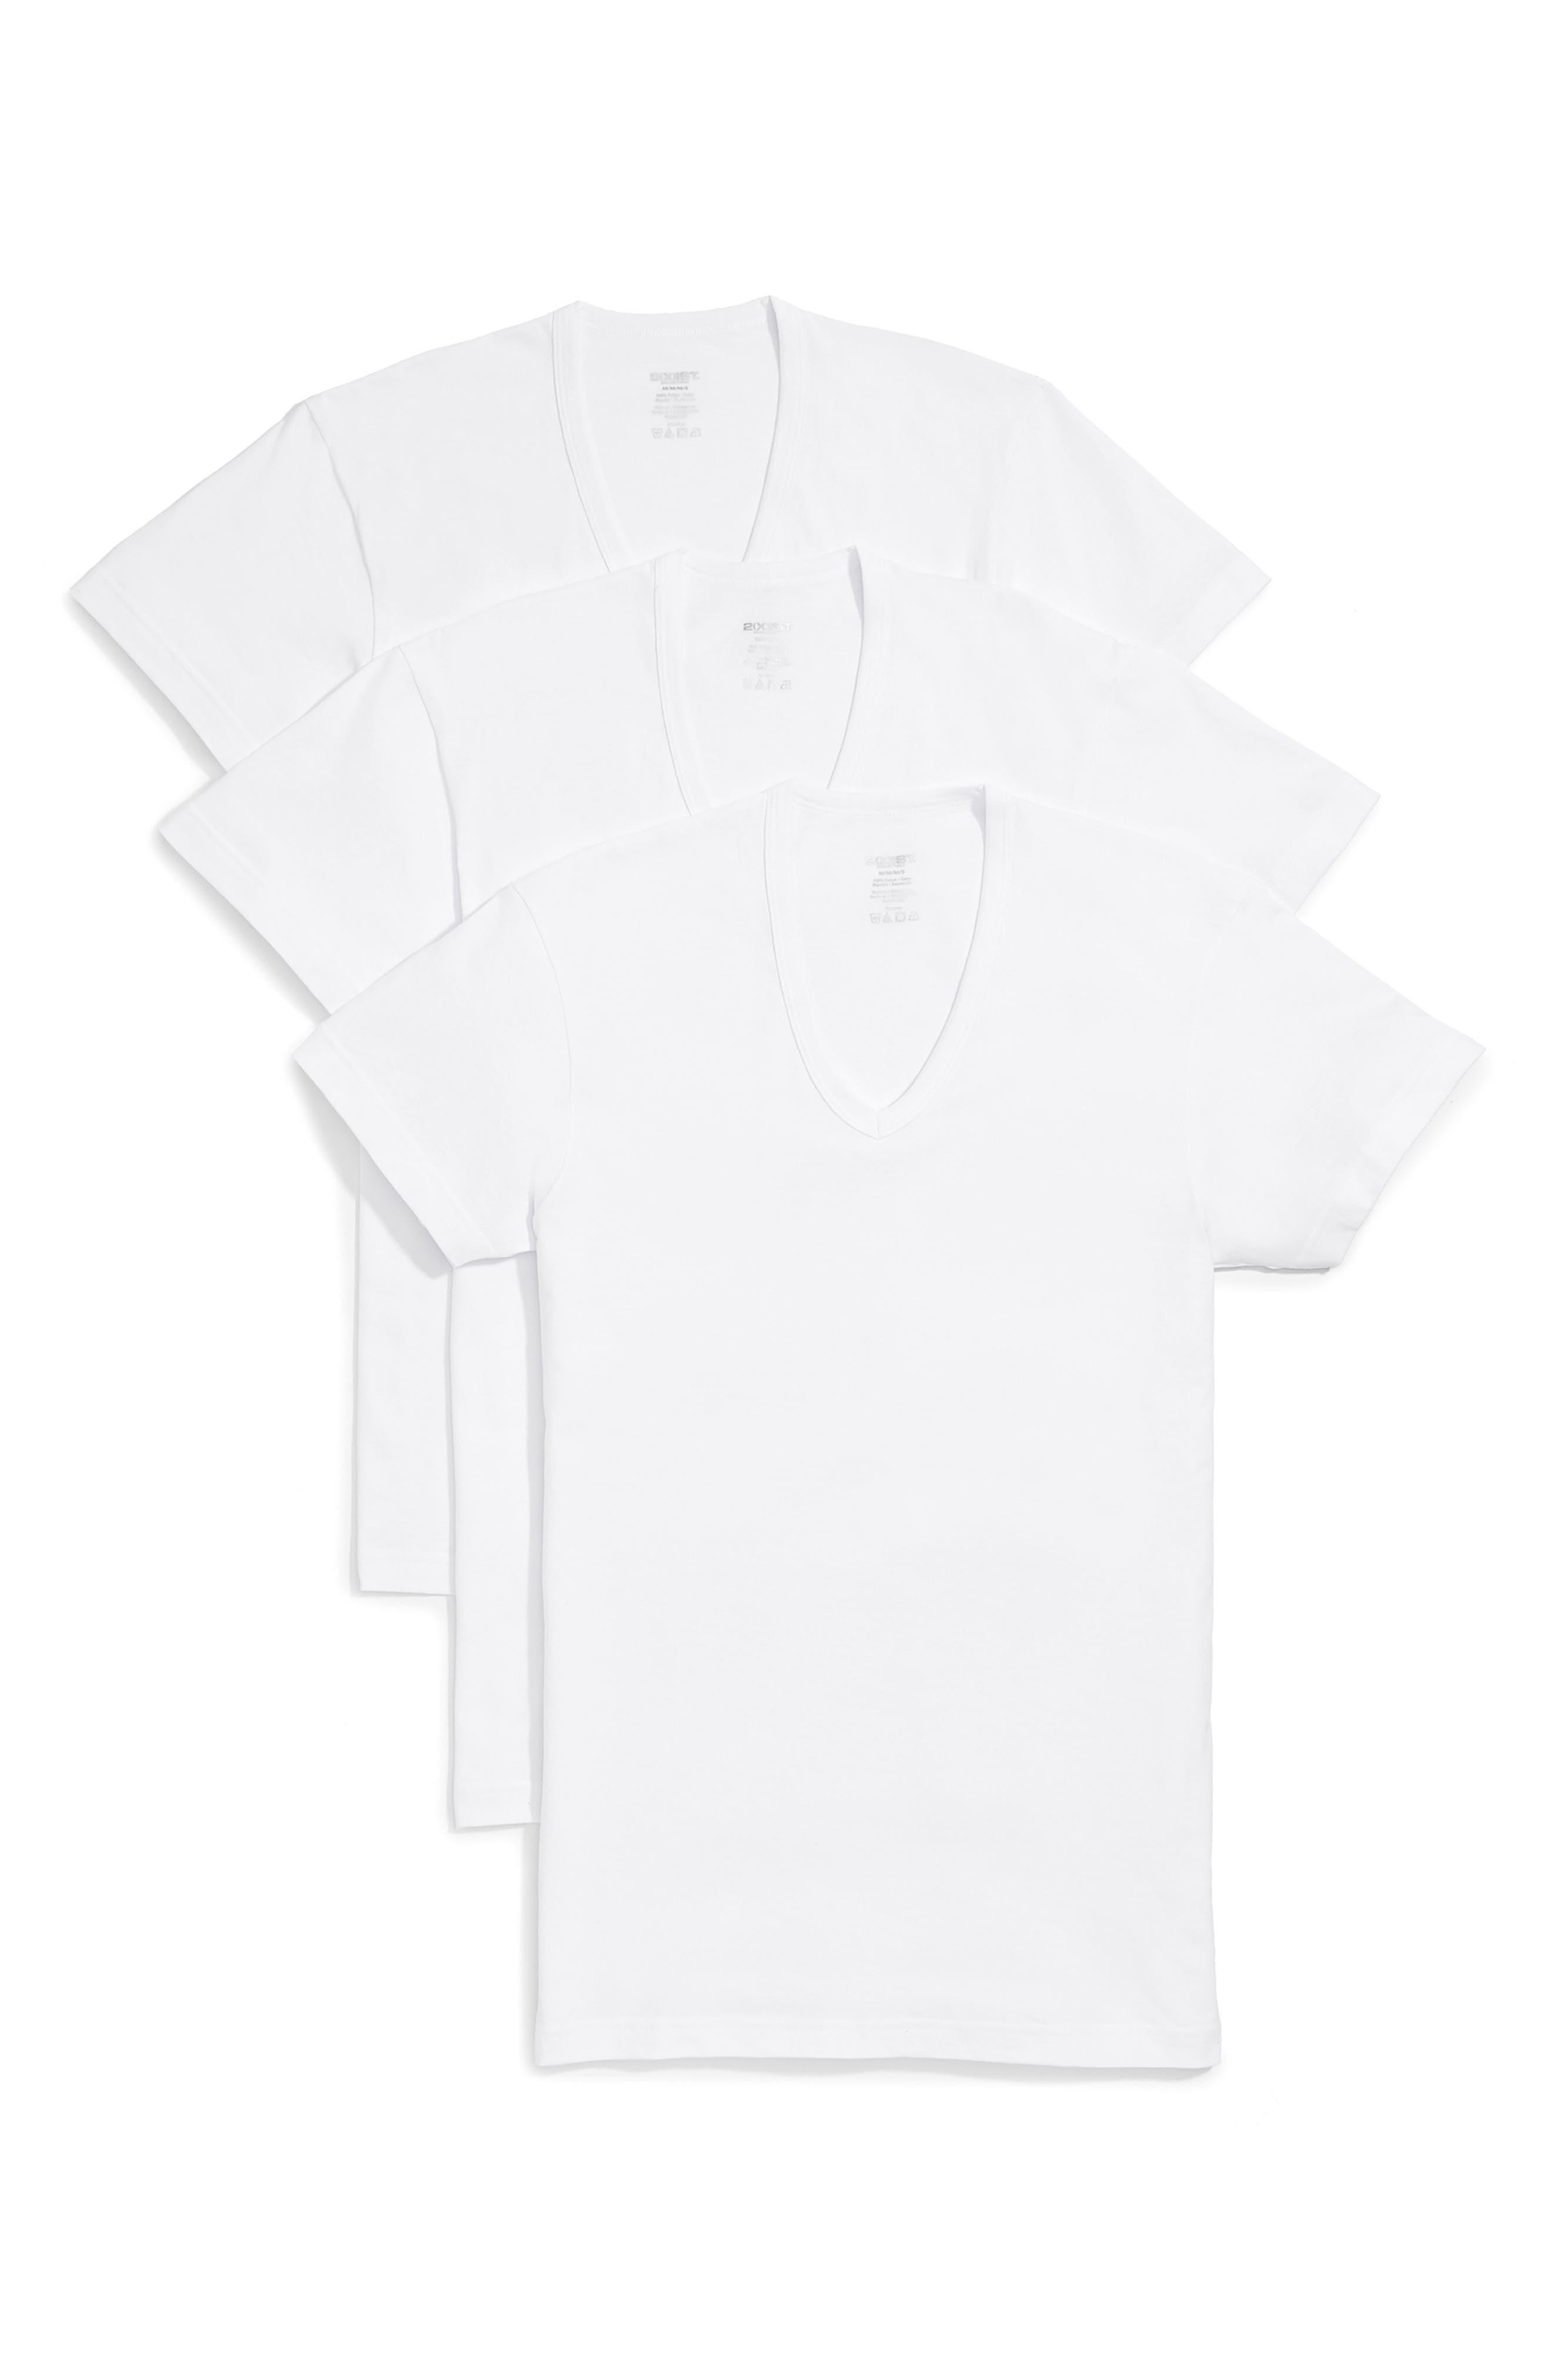 Slim Fit 3-Pack Cotton T-Shirt,                             Main thumbnail 1, color,                             WHITE NEW LOGO